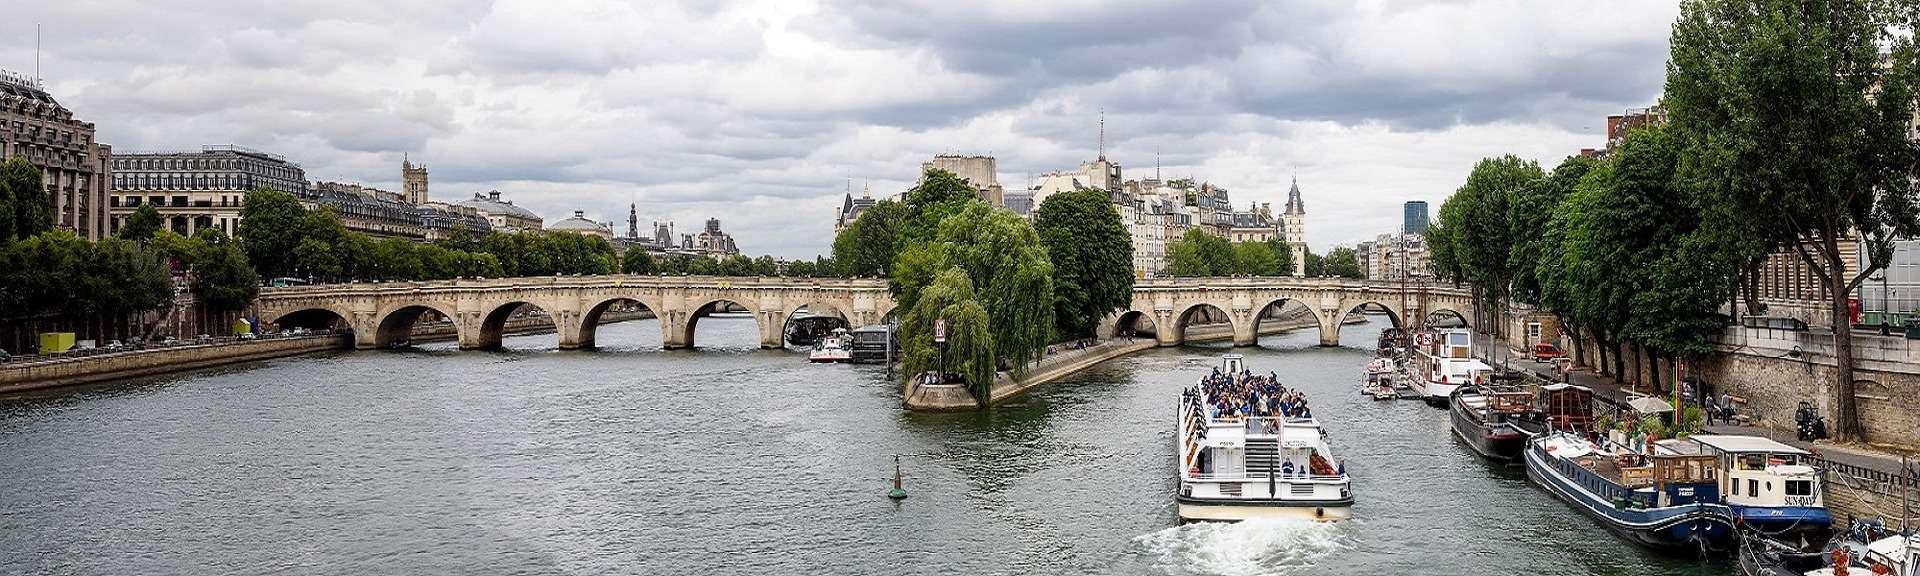 cruise on the Seine in Paris